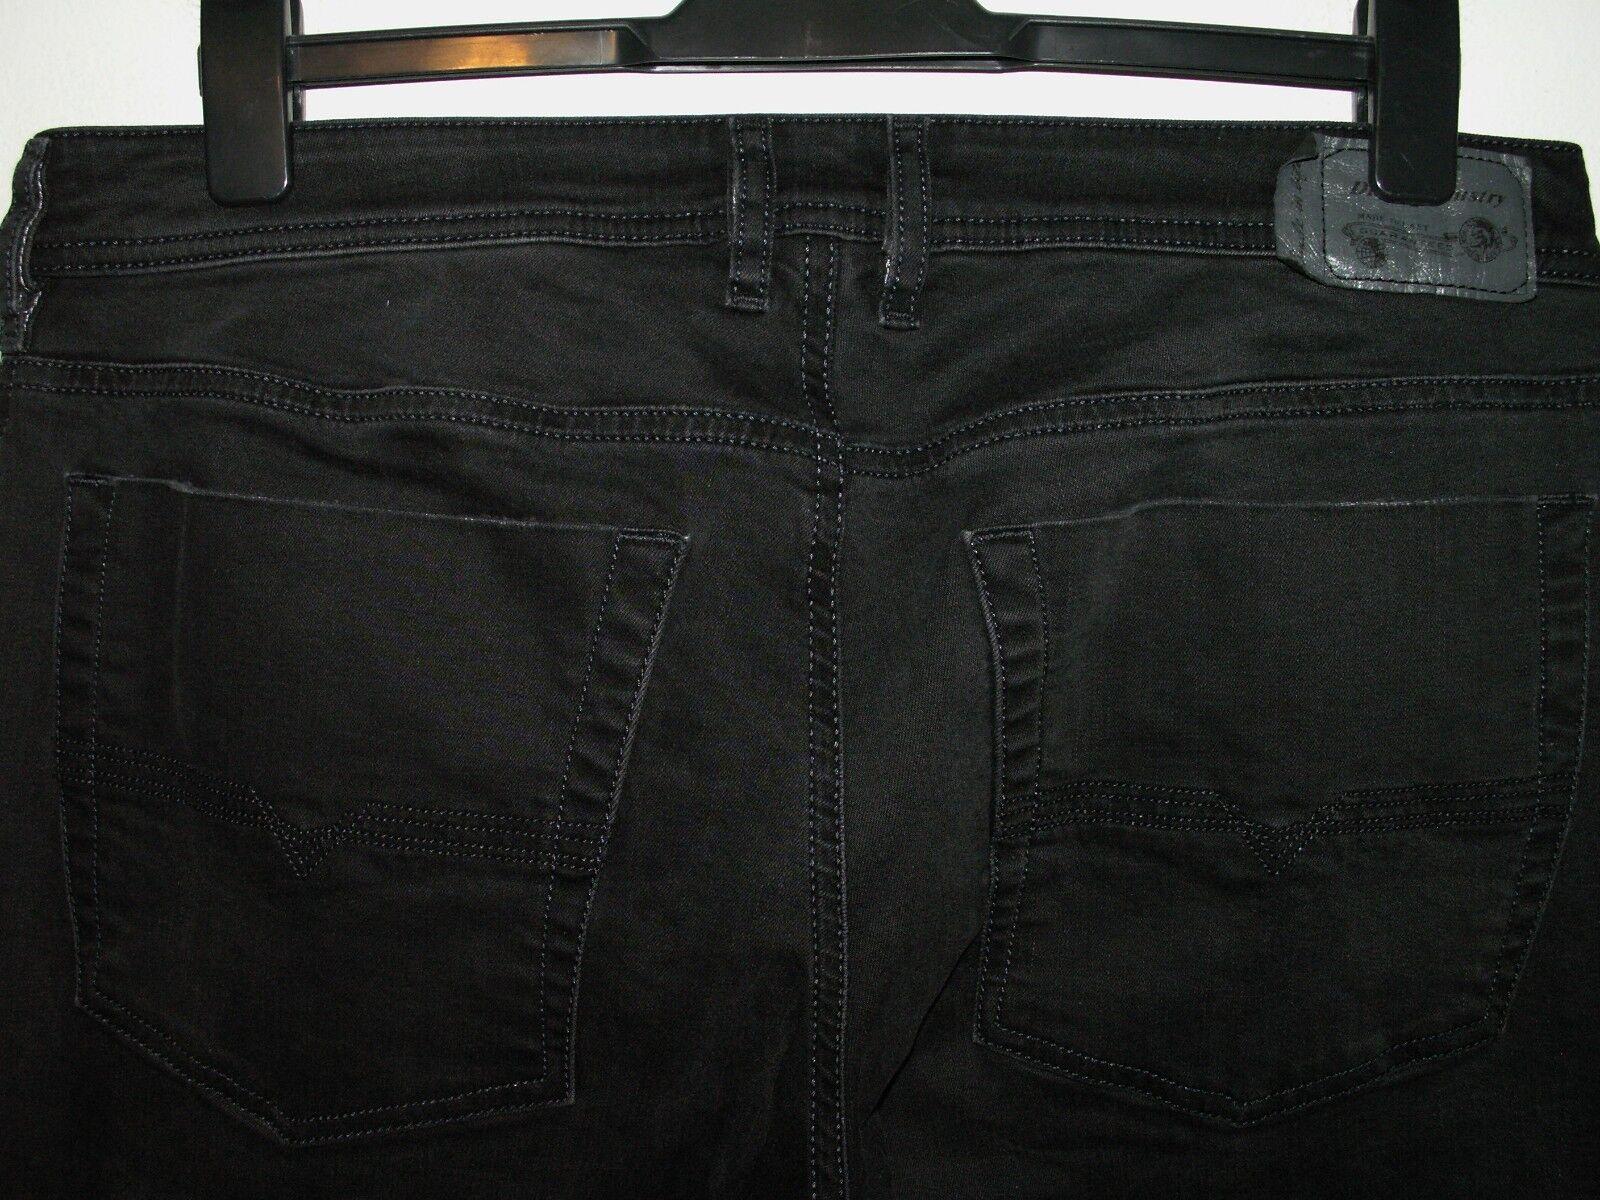 Diesel zatiny bootcut jeans wash RA468 stretch W33 L32 (a3793)